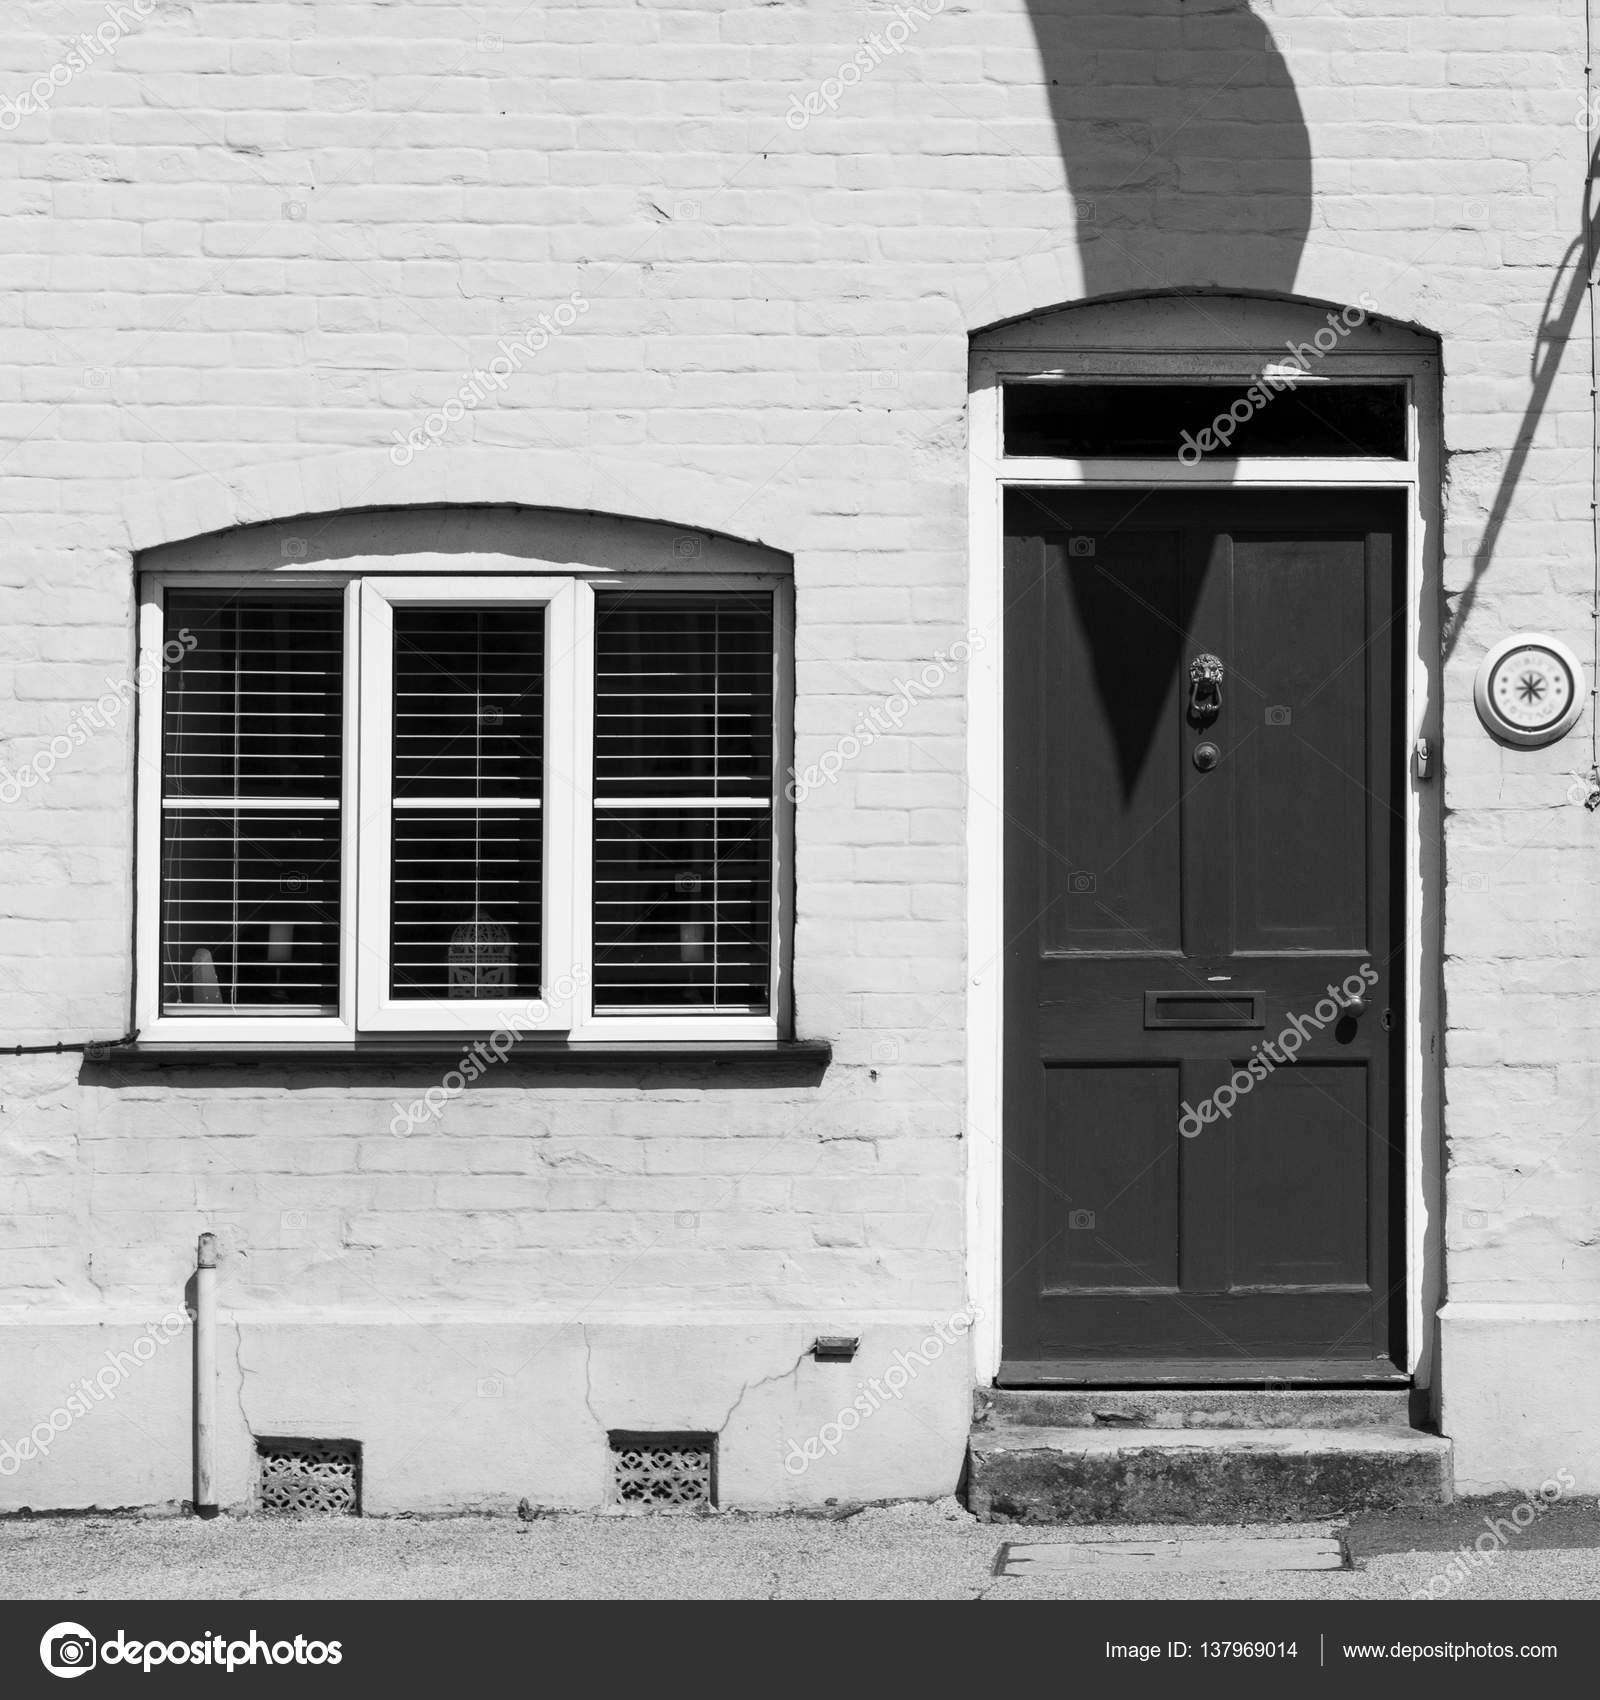 Yorum: kapı, pencere, ev